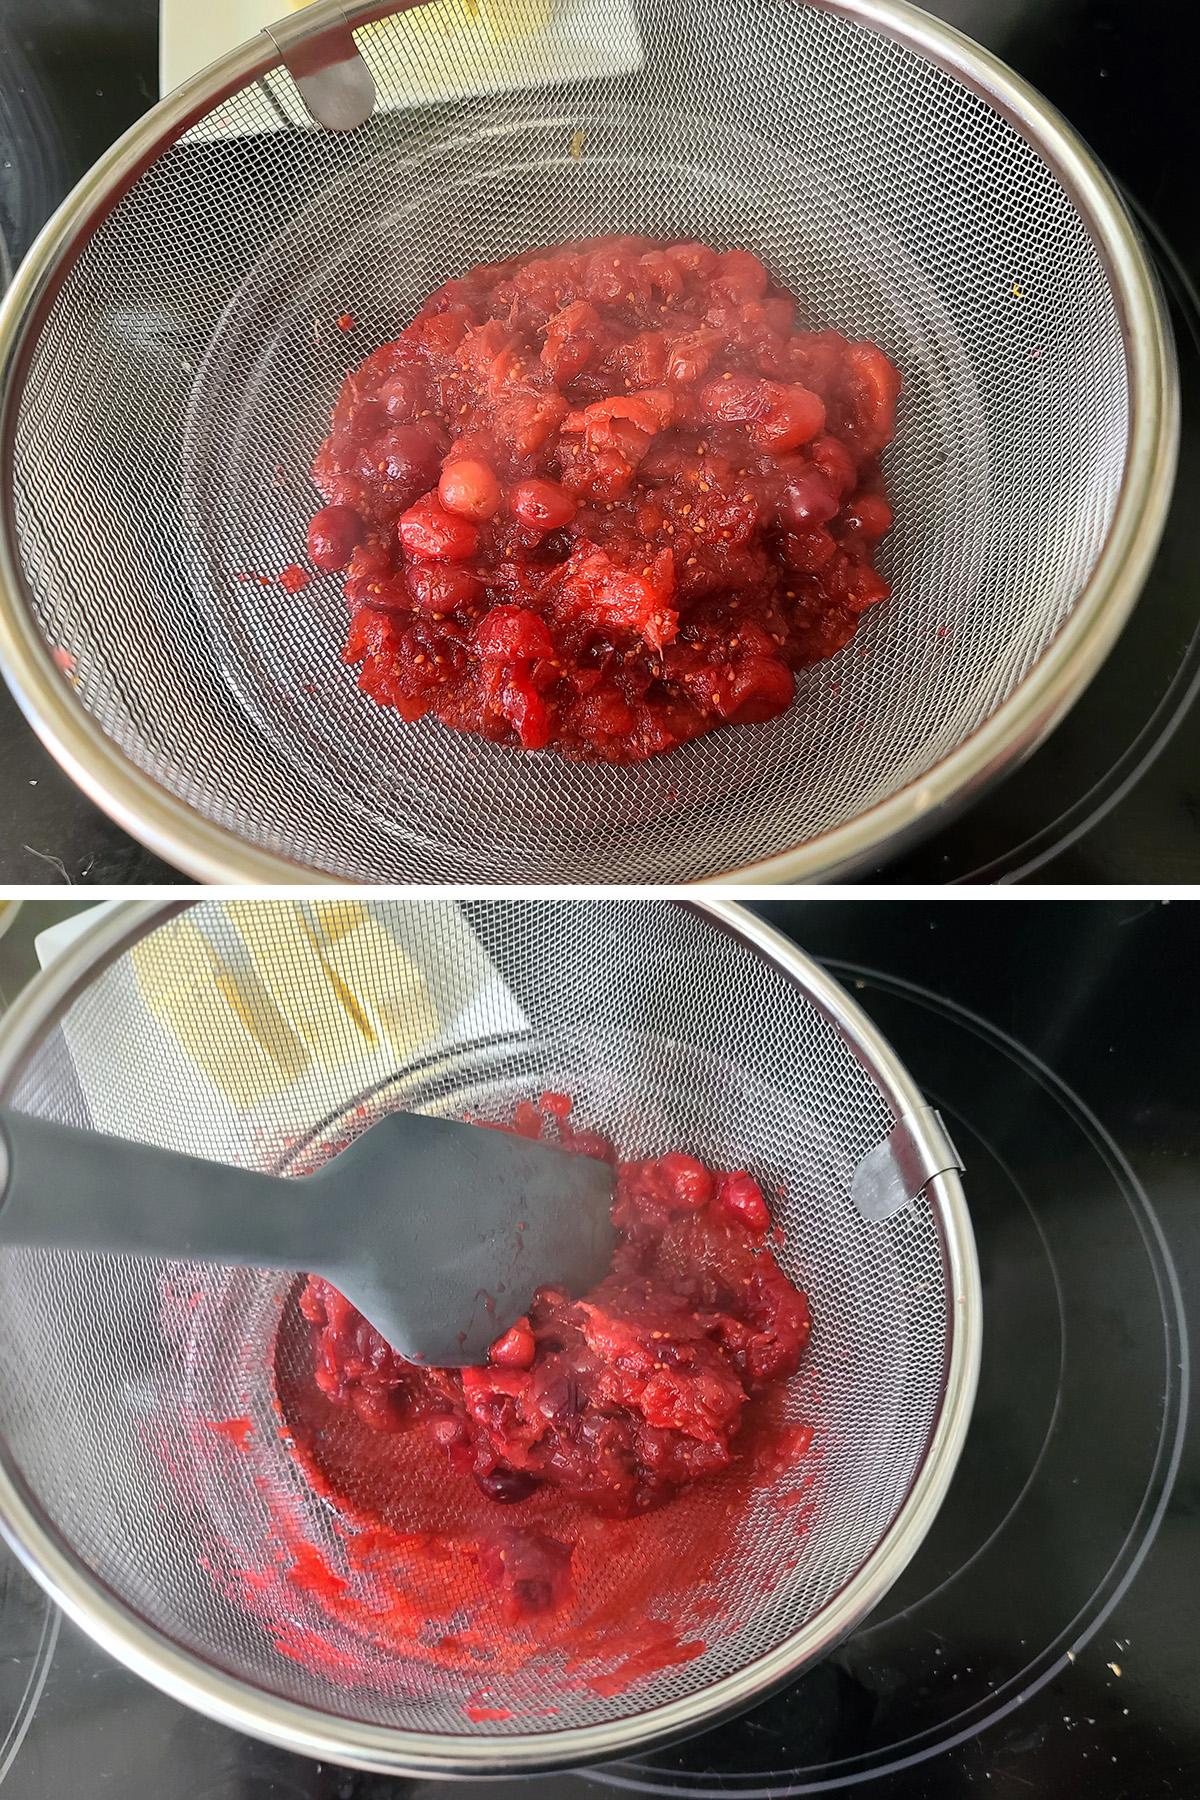 Cranberries being pressed through a wire sieve.